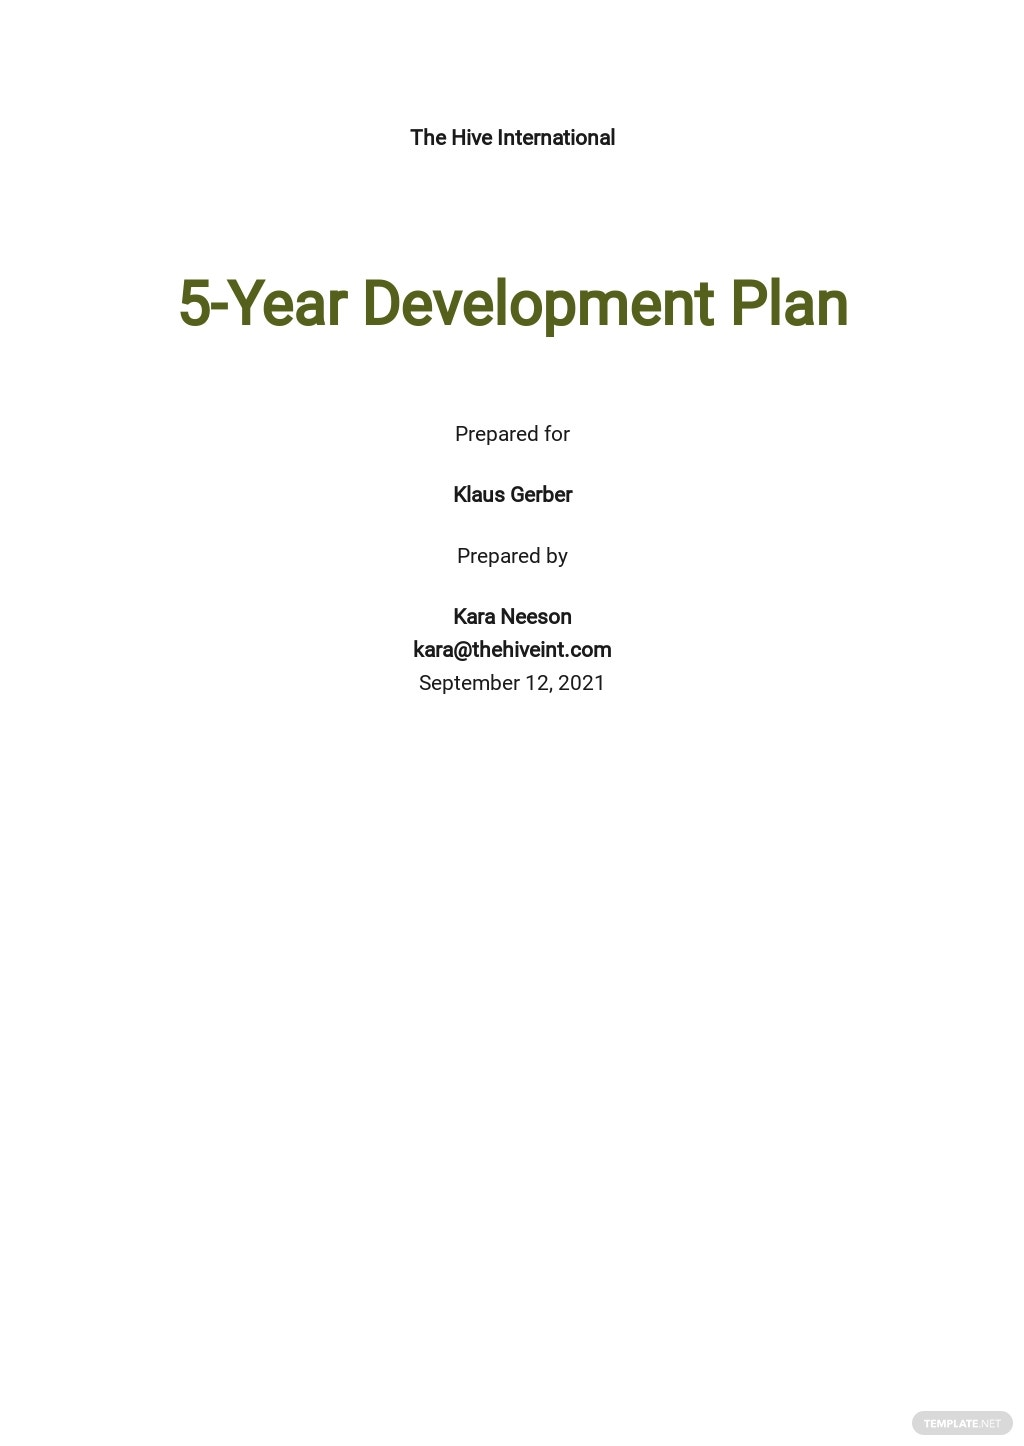 5 Year Development Plan Template.jpe